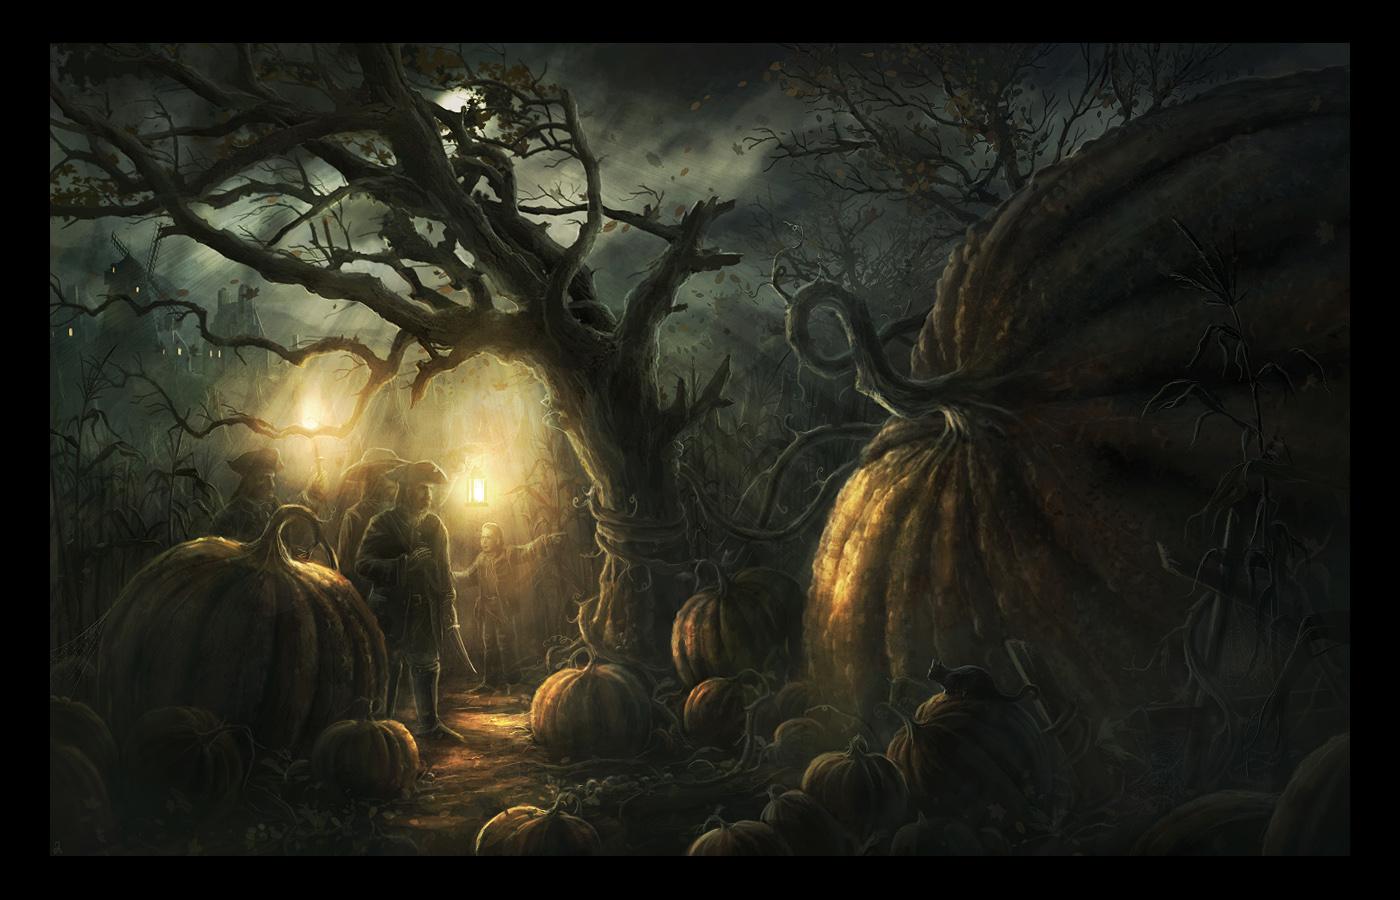 Mother Pumpkin by RadoJavor